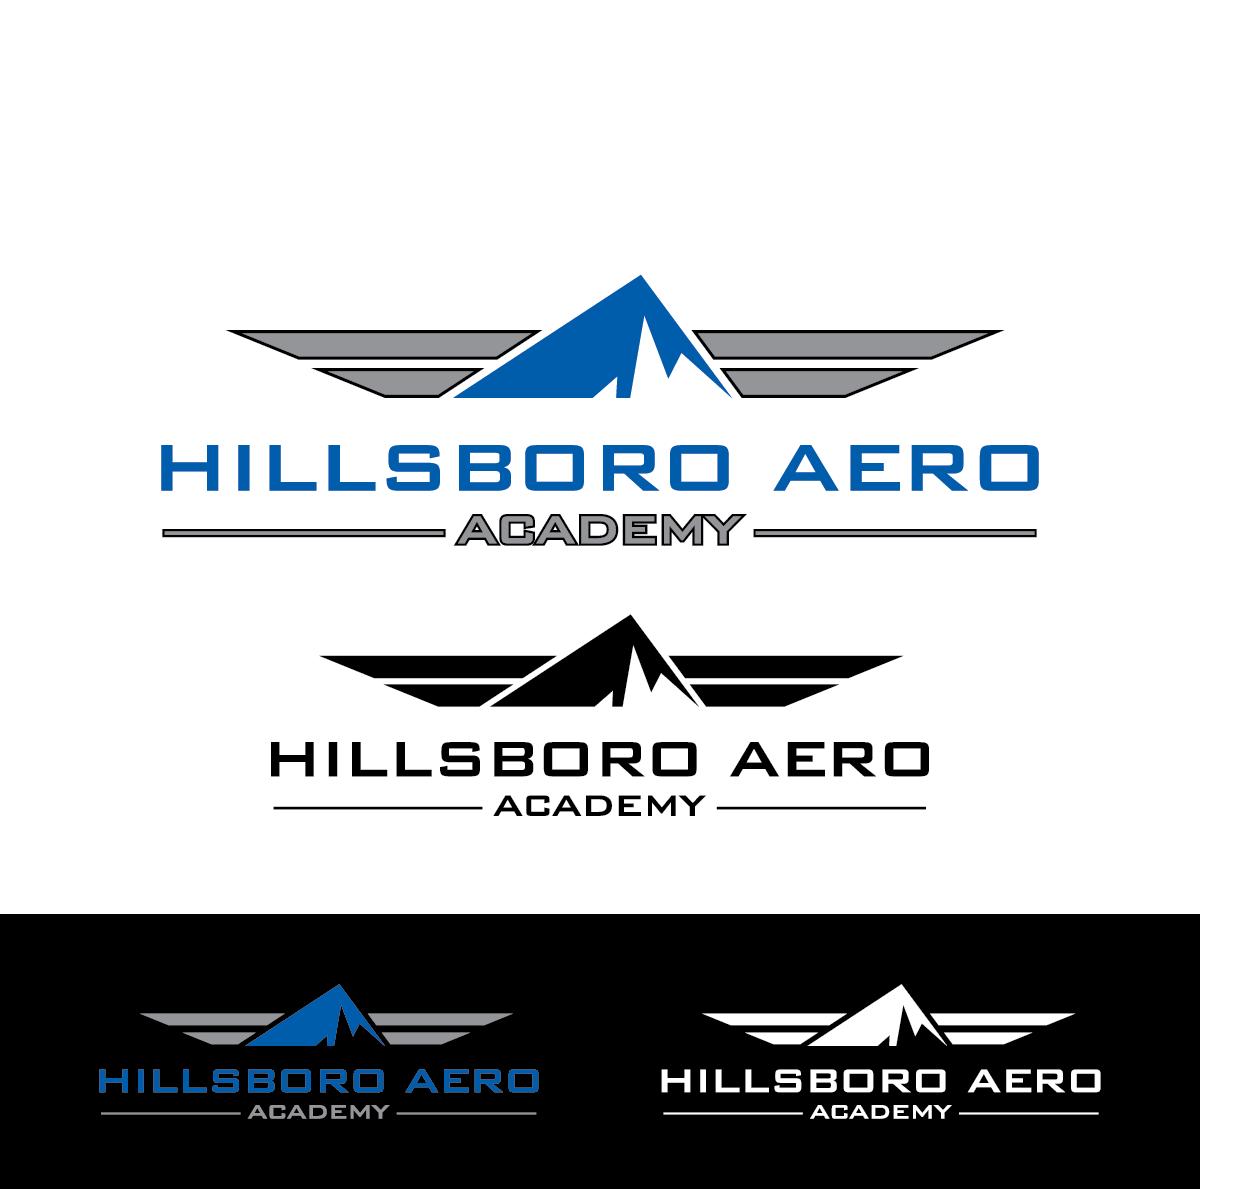 Hillsboro Aero Logo Wiring Diagrams Ogo Diagram Serious Masculine Training Design For Academy Rh Designcrowd Com Aviation Logos Eagles